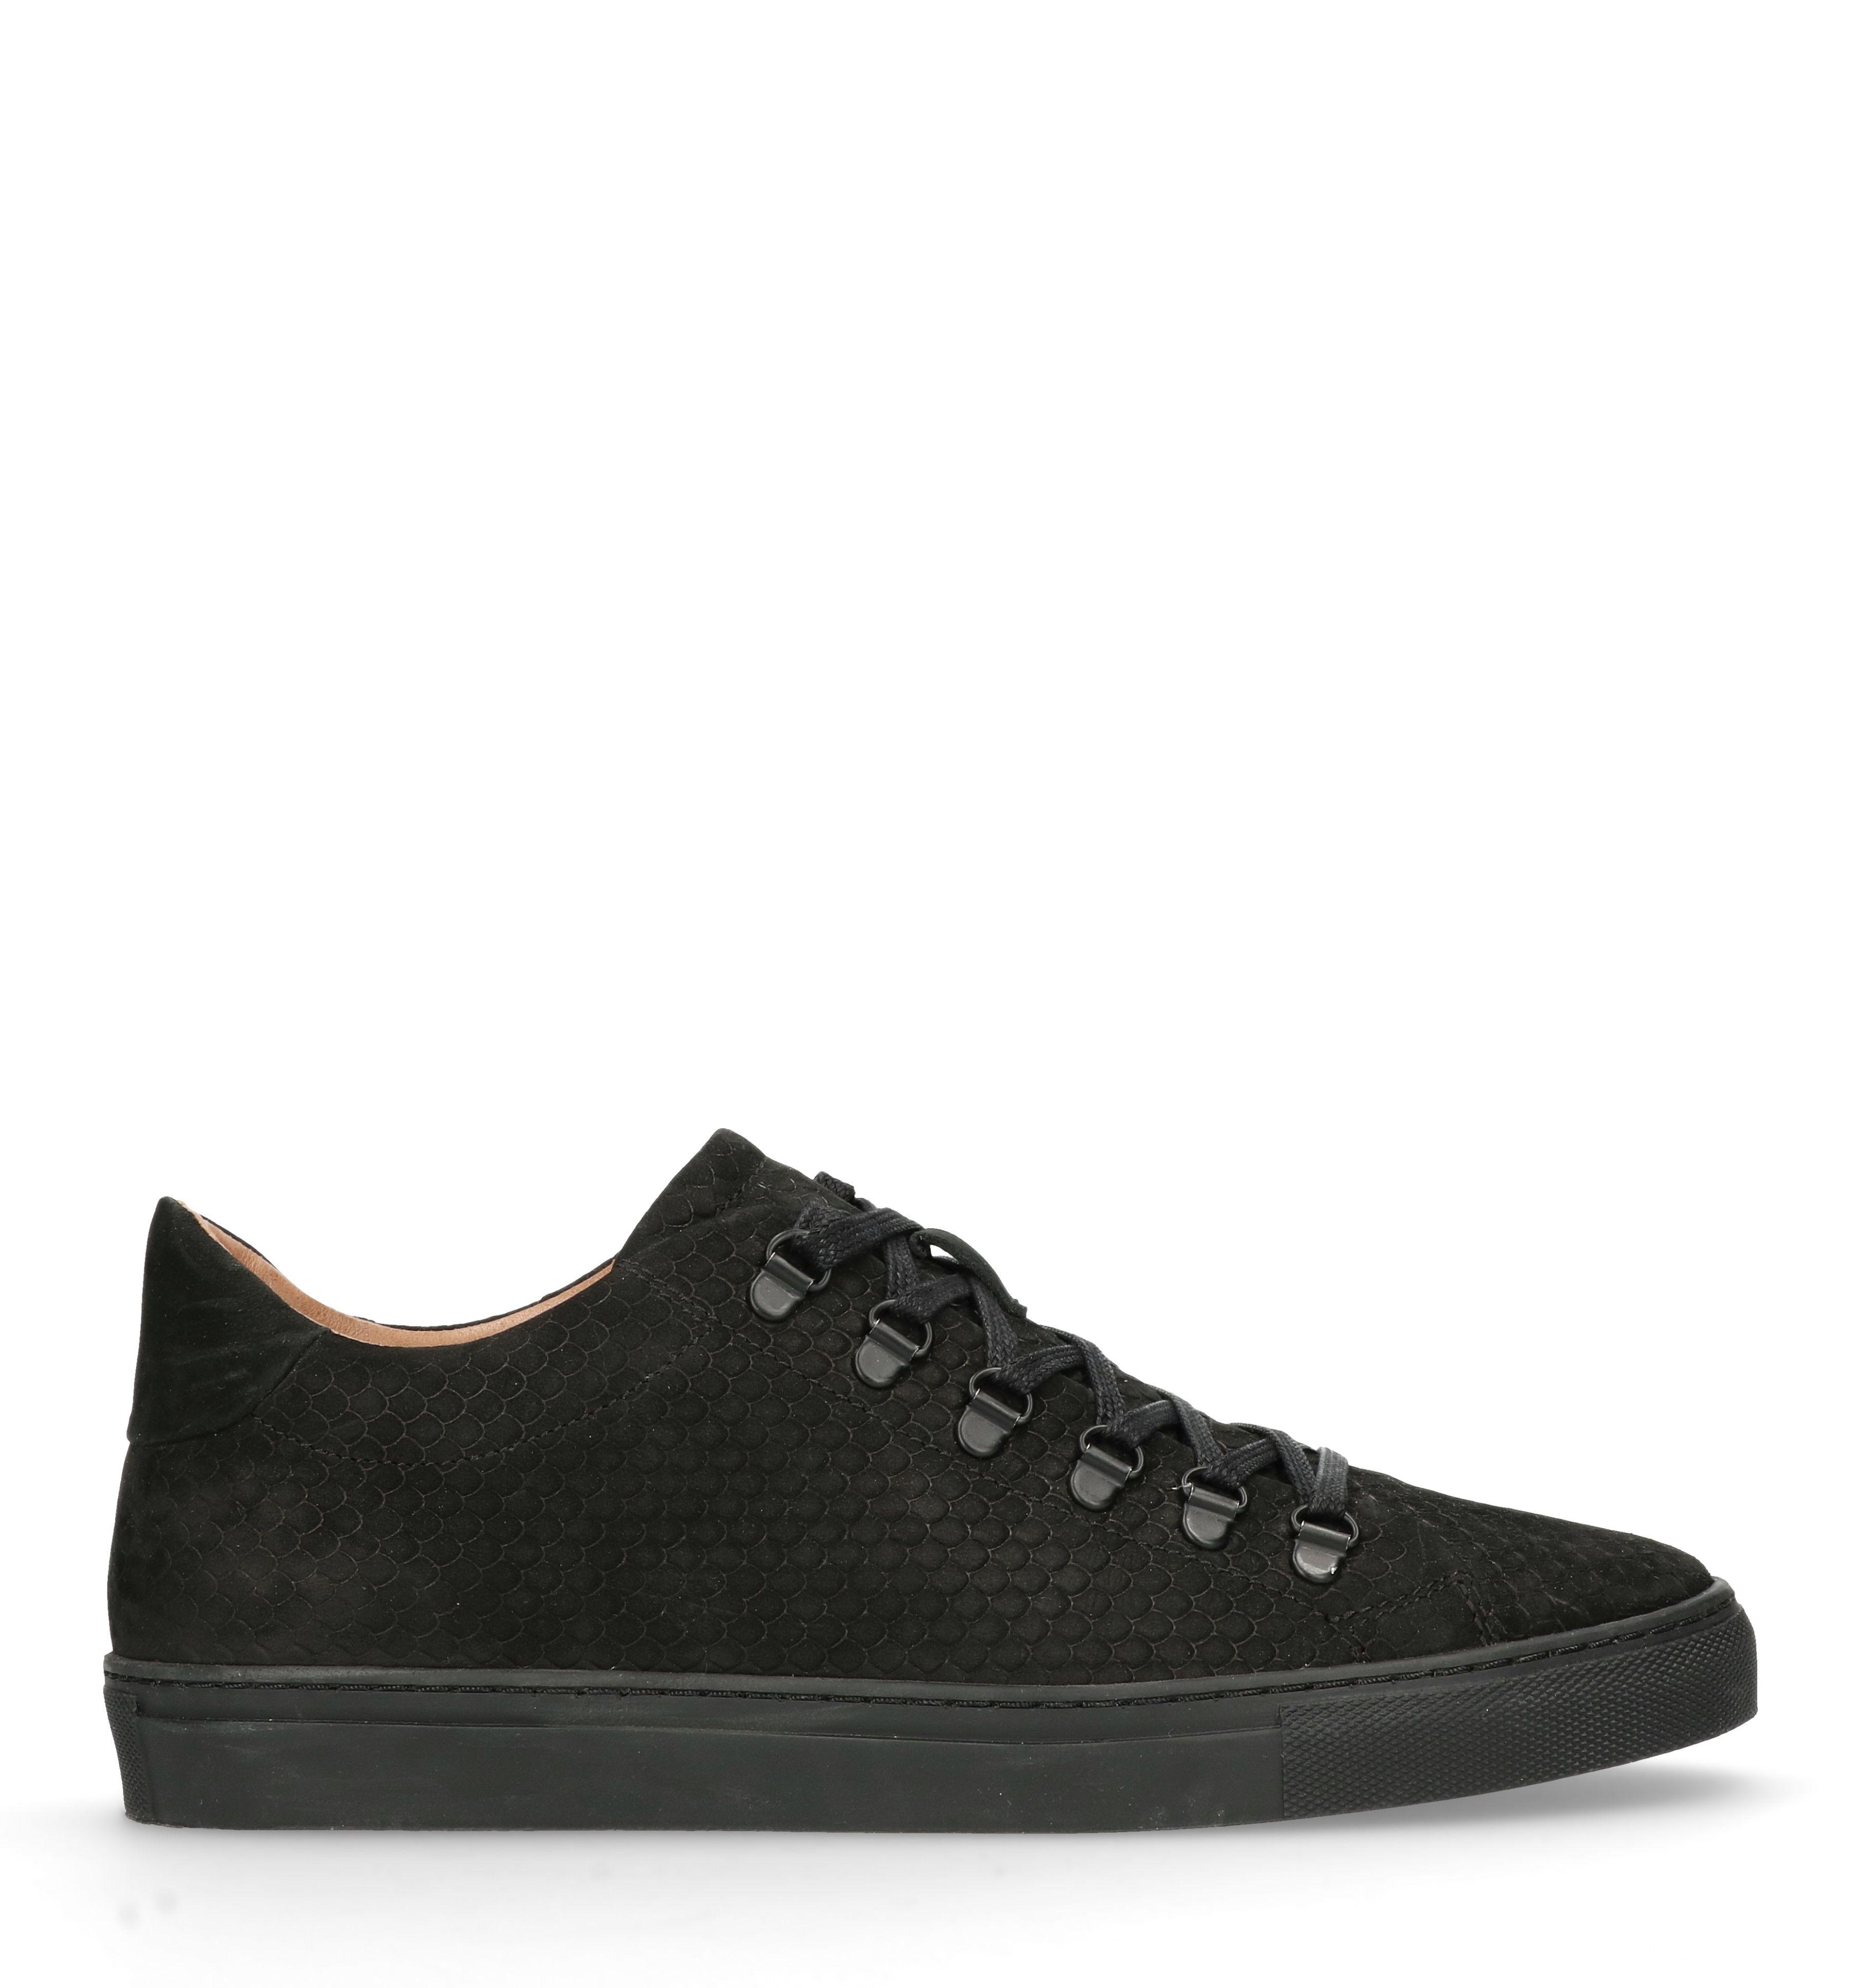 choizz schoenen dames laarzen winter bruin